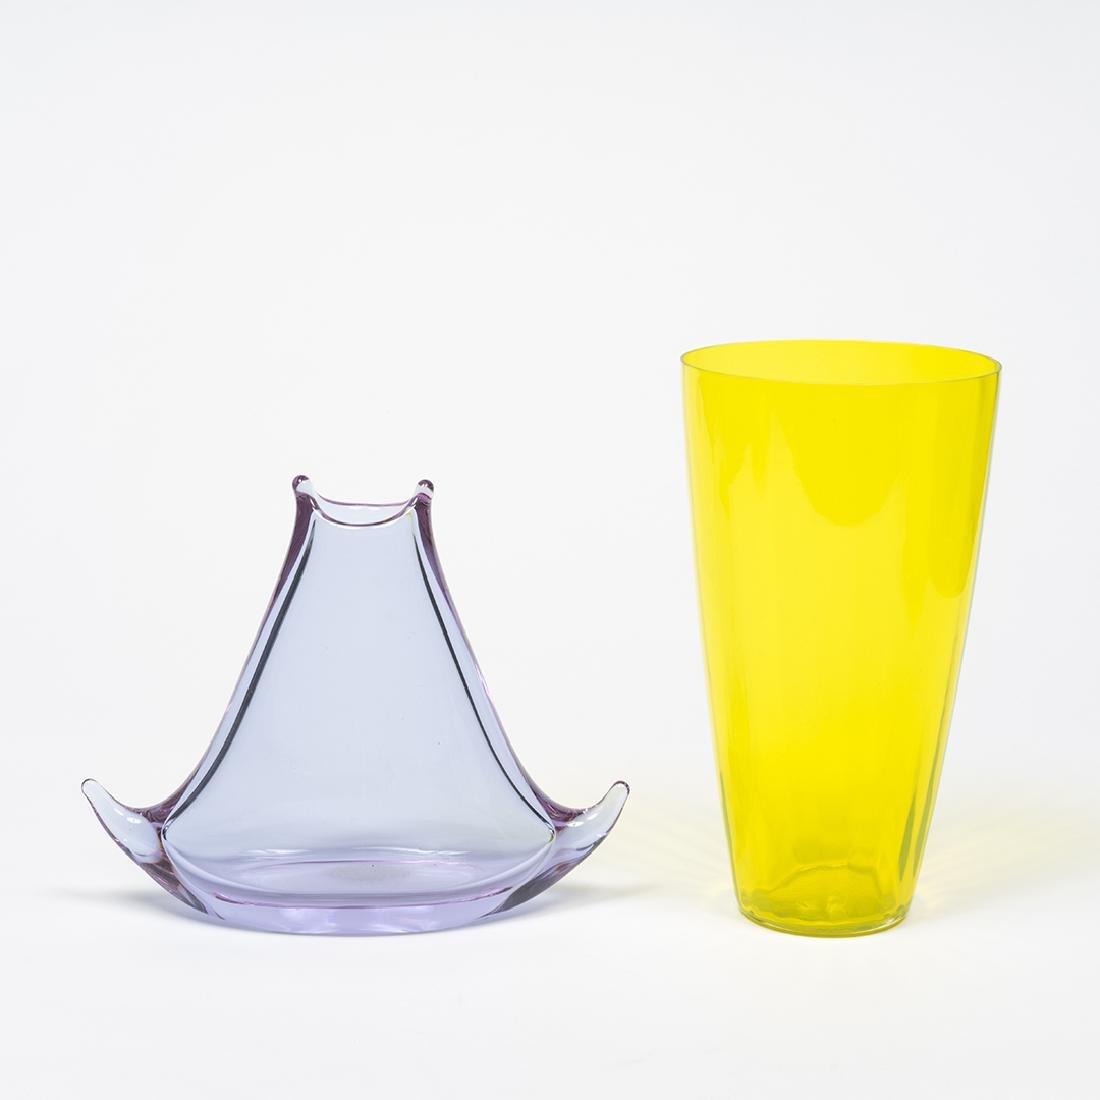 Murano Glass Objects (8) - 2